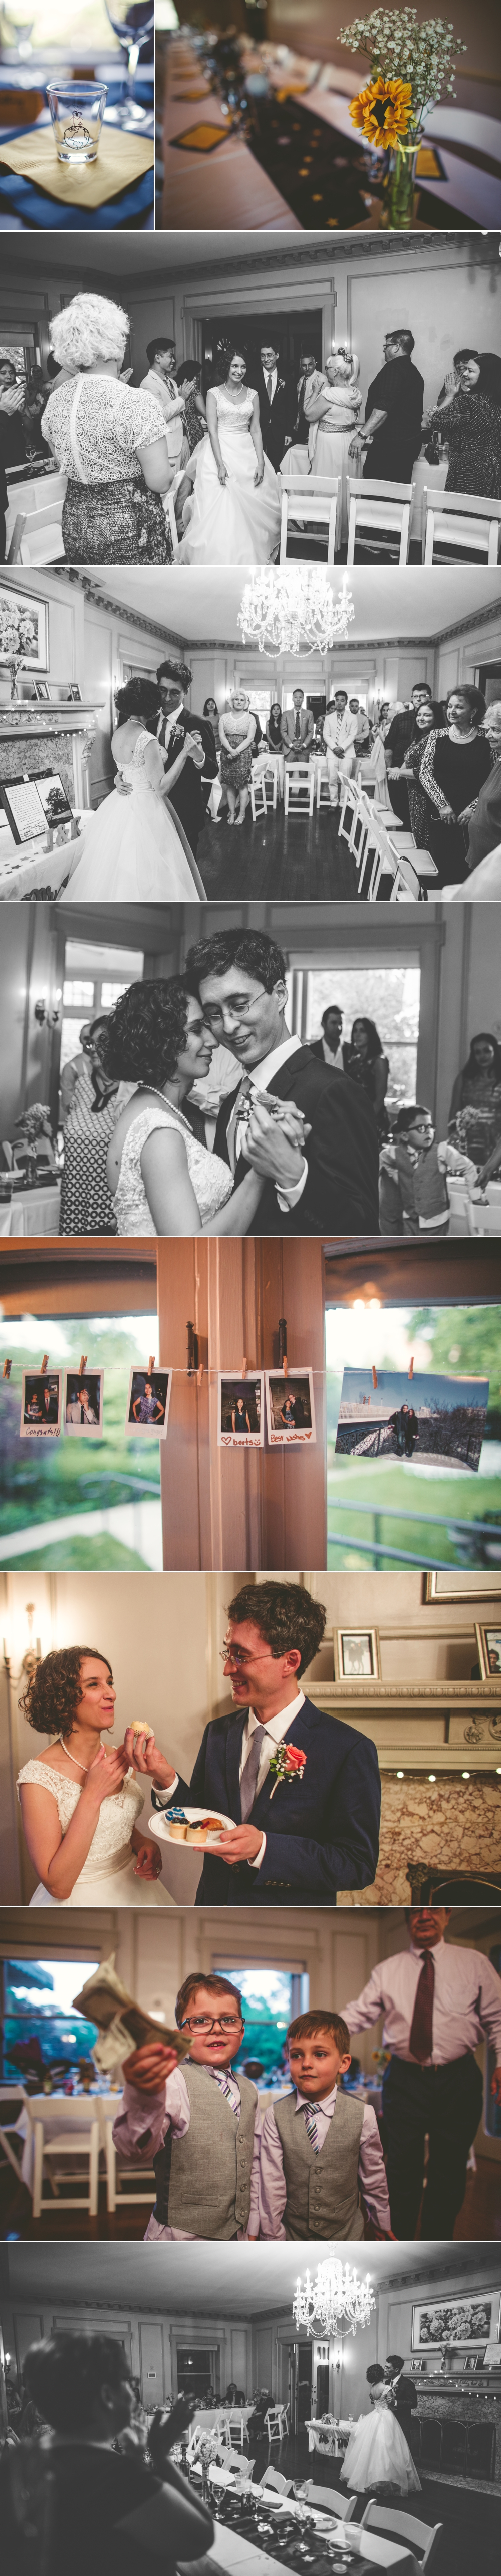 jason_domingues_photography_best_kansas_city_photographer_kc_weddings_simpson_house_0003